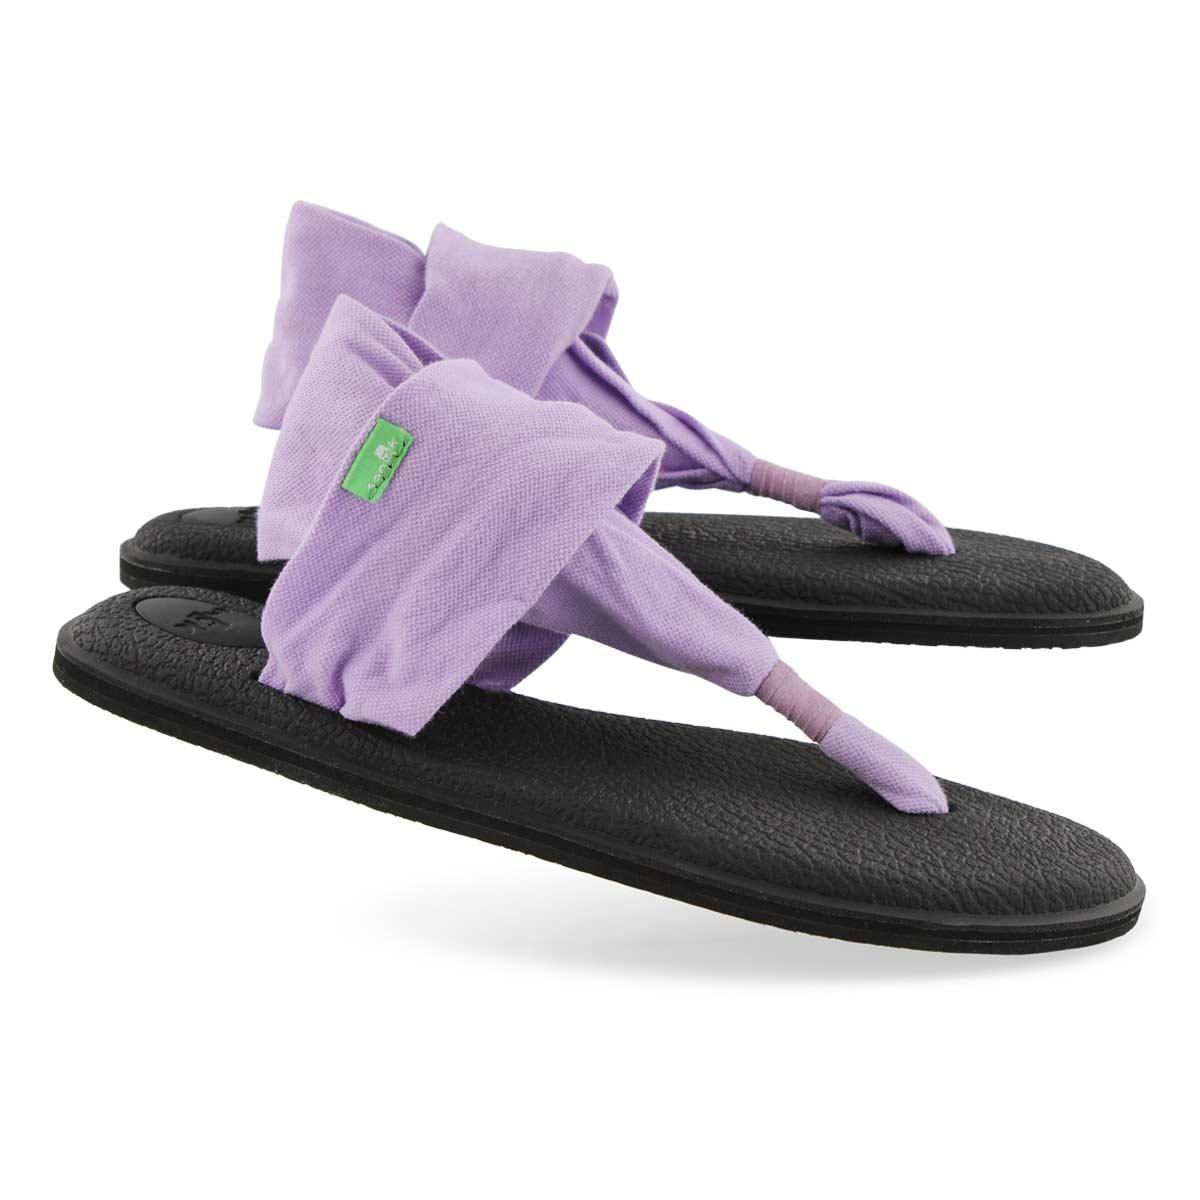 Lds Yoga Sling lavendula thong sandal